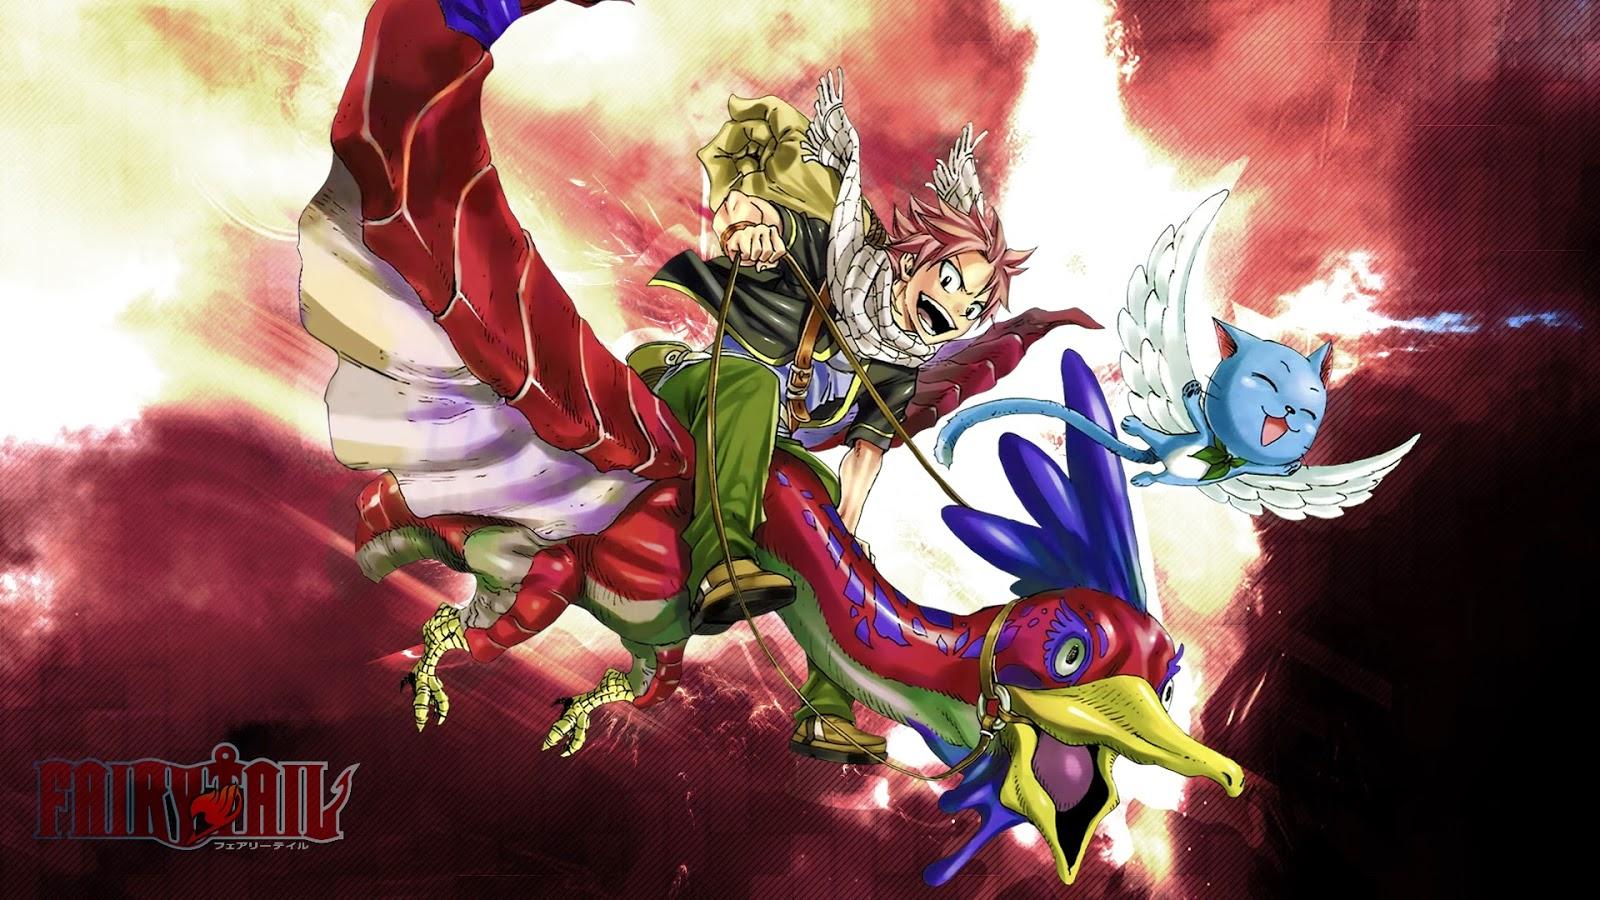 Fairy Tail Wallpaper Hd Anime Fairytail